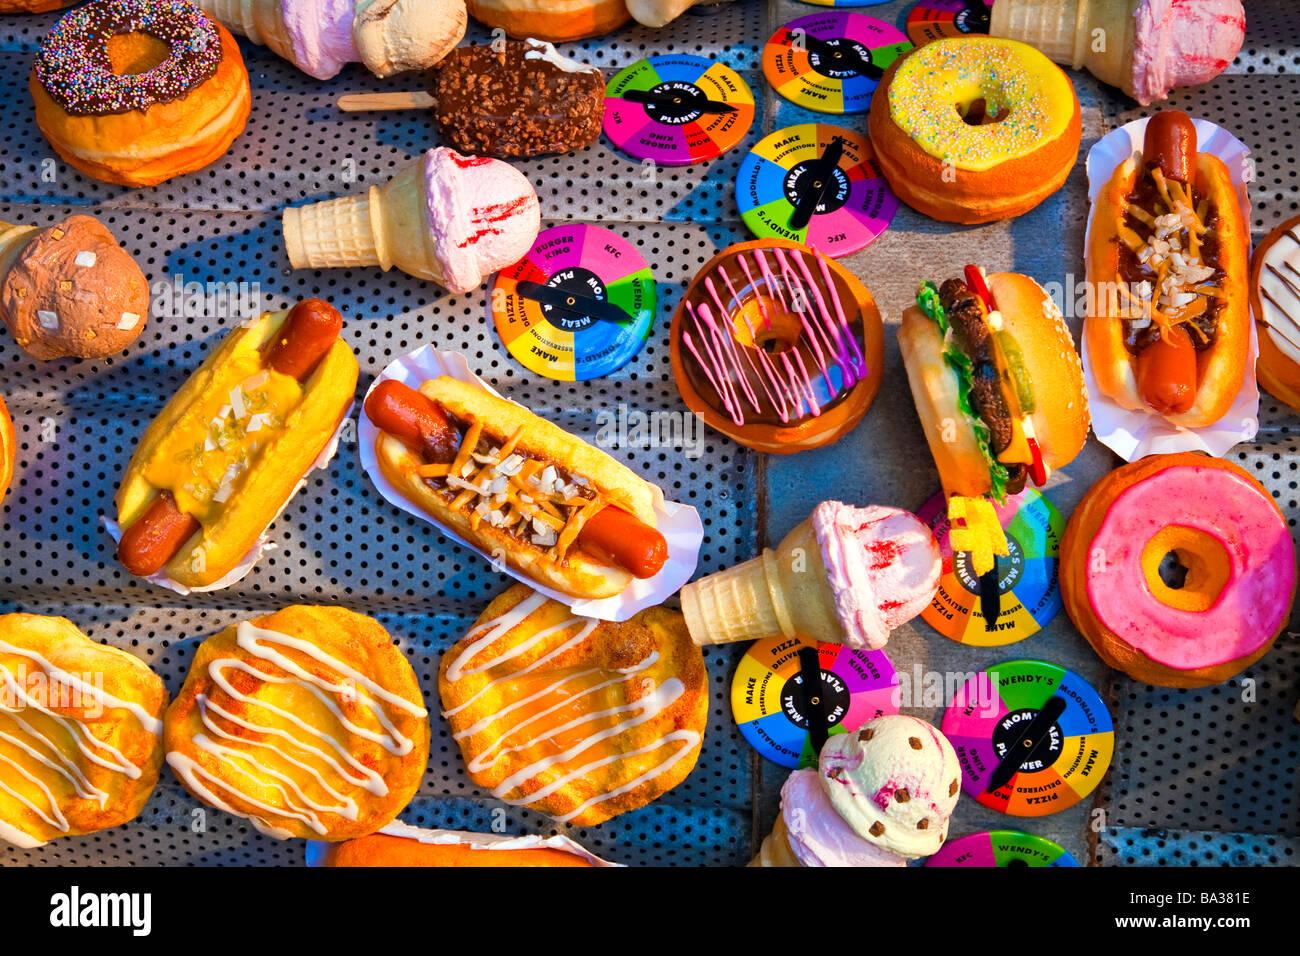 Unhealthy Food Or Junk Food Or Fast Food Like Stock Photo